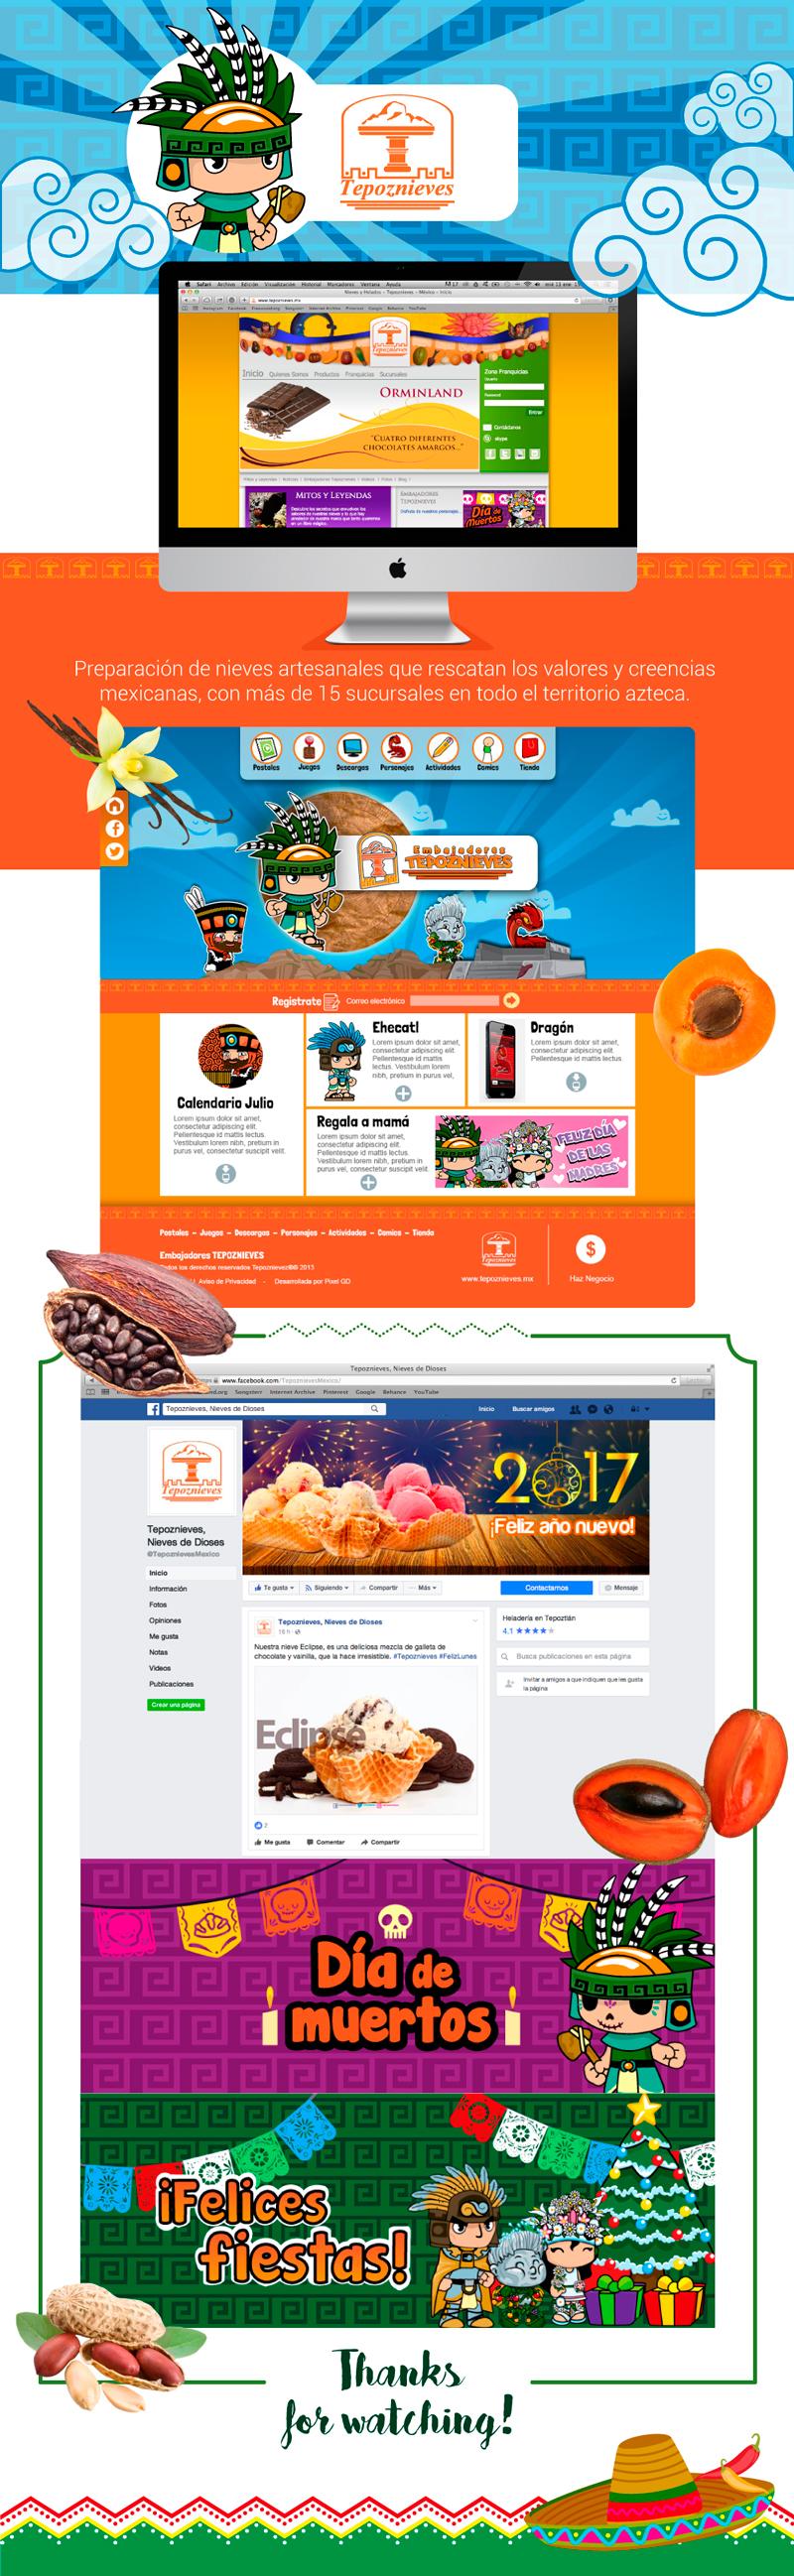 Diseño Web - Social Media